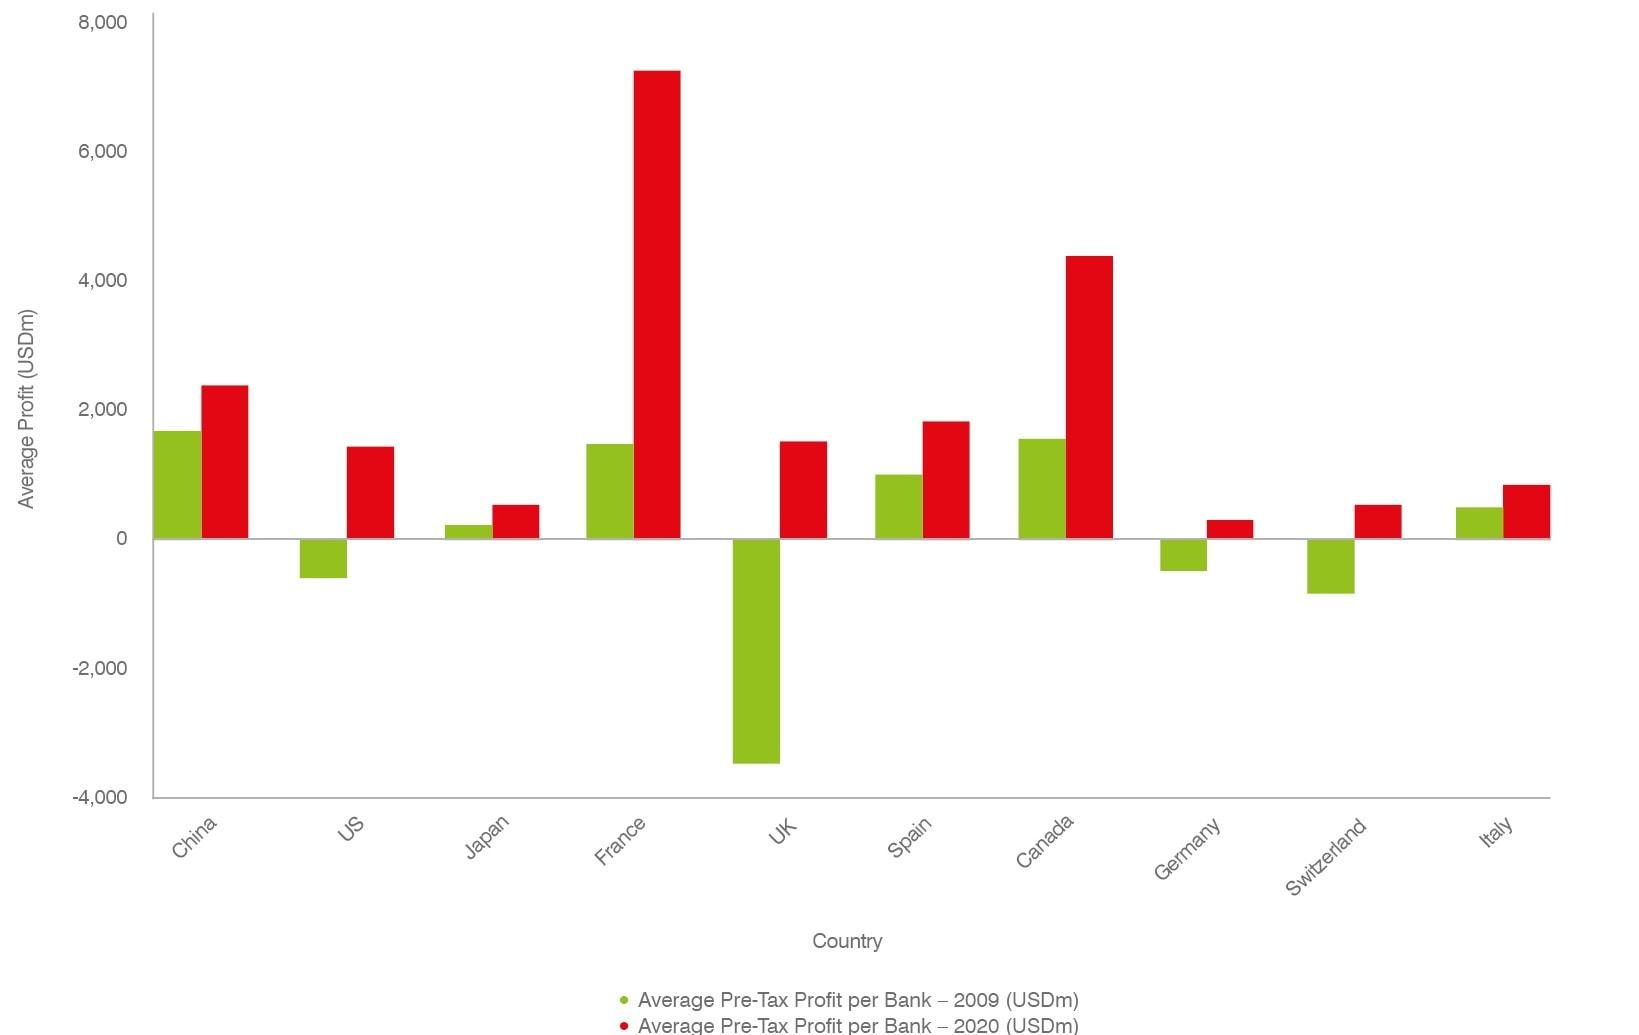 Average Profit per Bank (USDm)